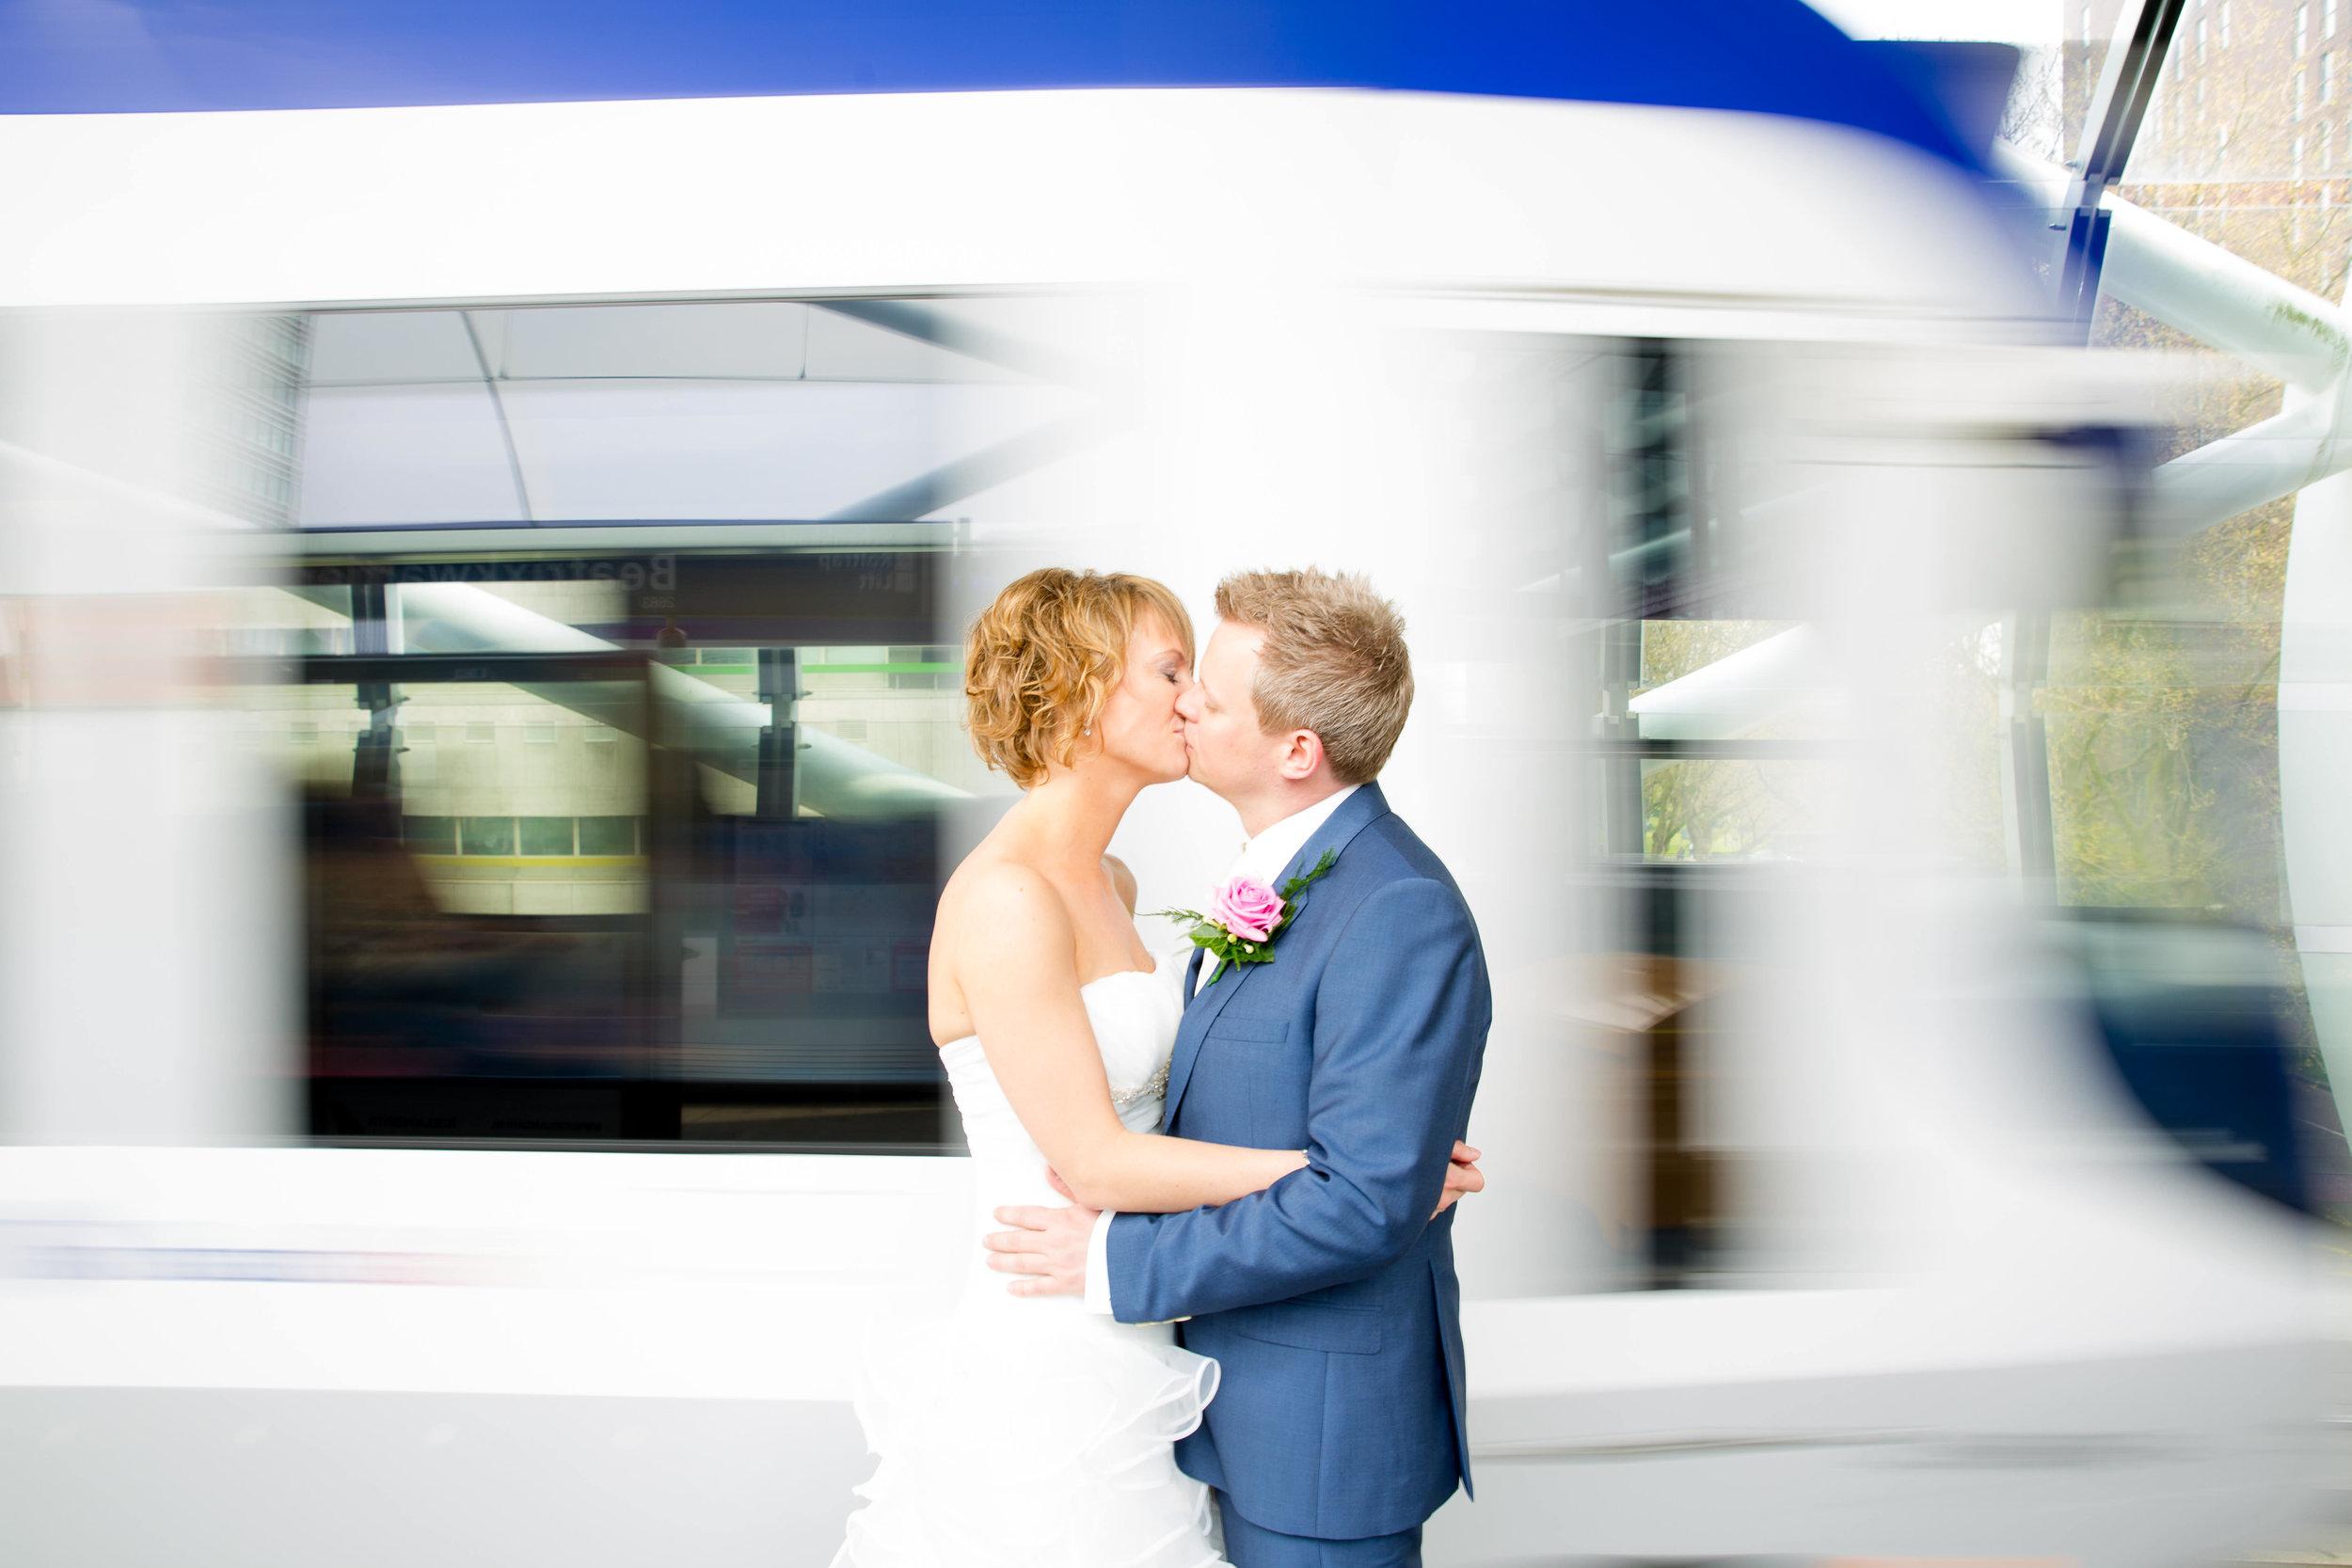 trouwshoot-bruidsfotografie-trouwfoto-feestfotografie-marcel en desiree-285.jpg